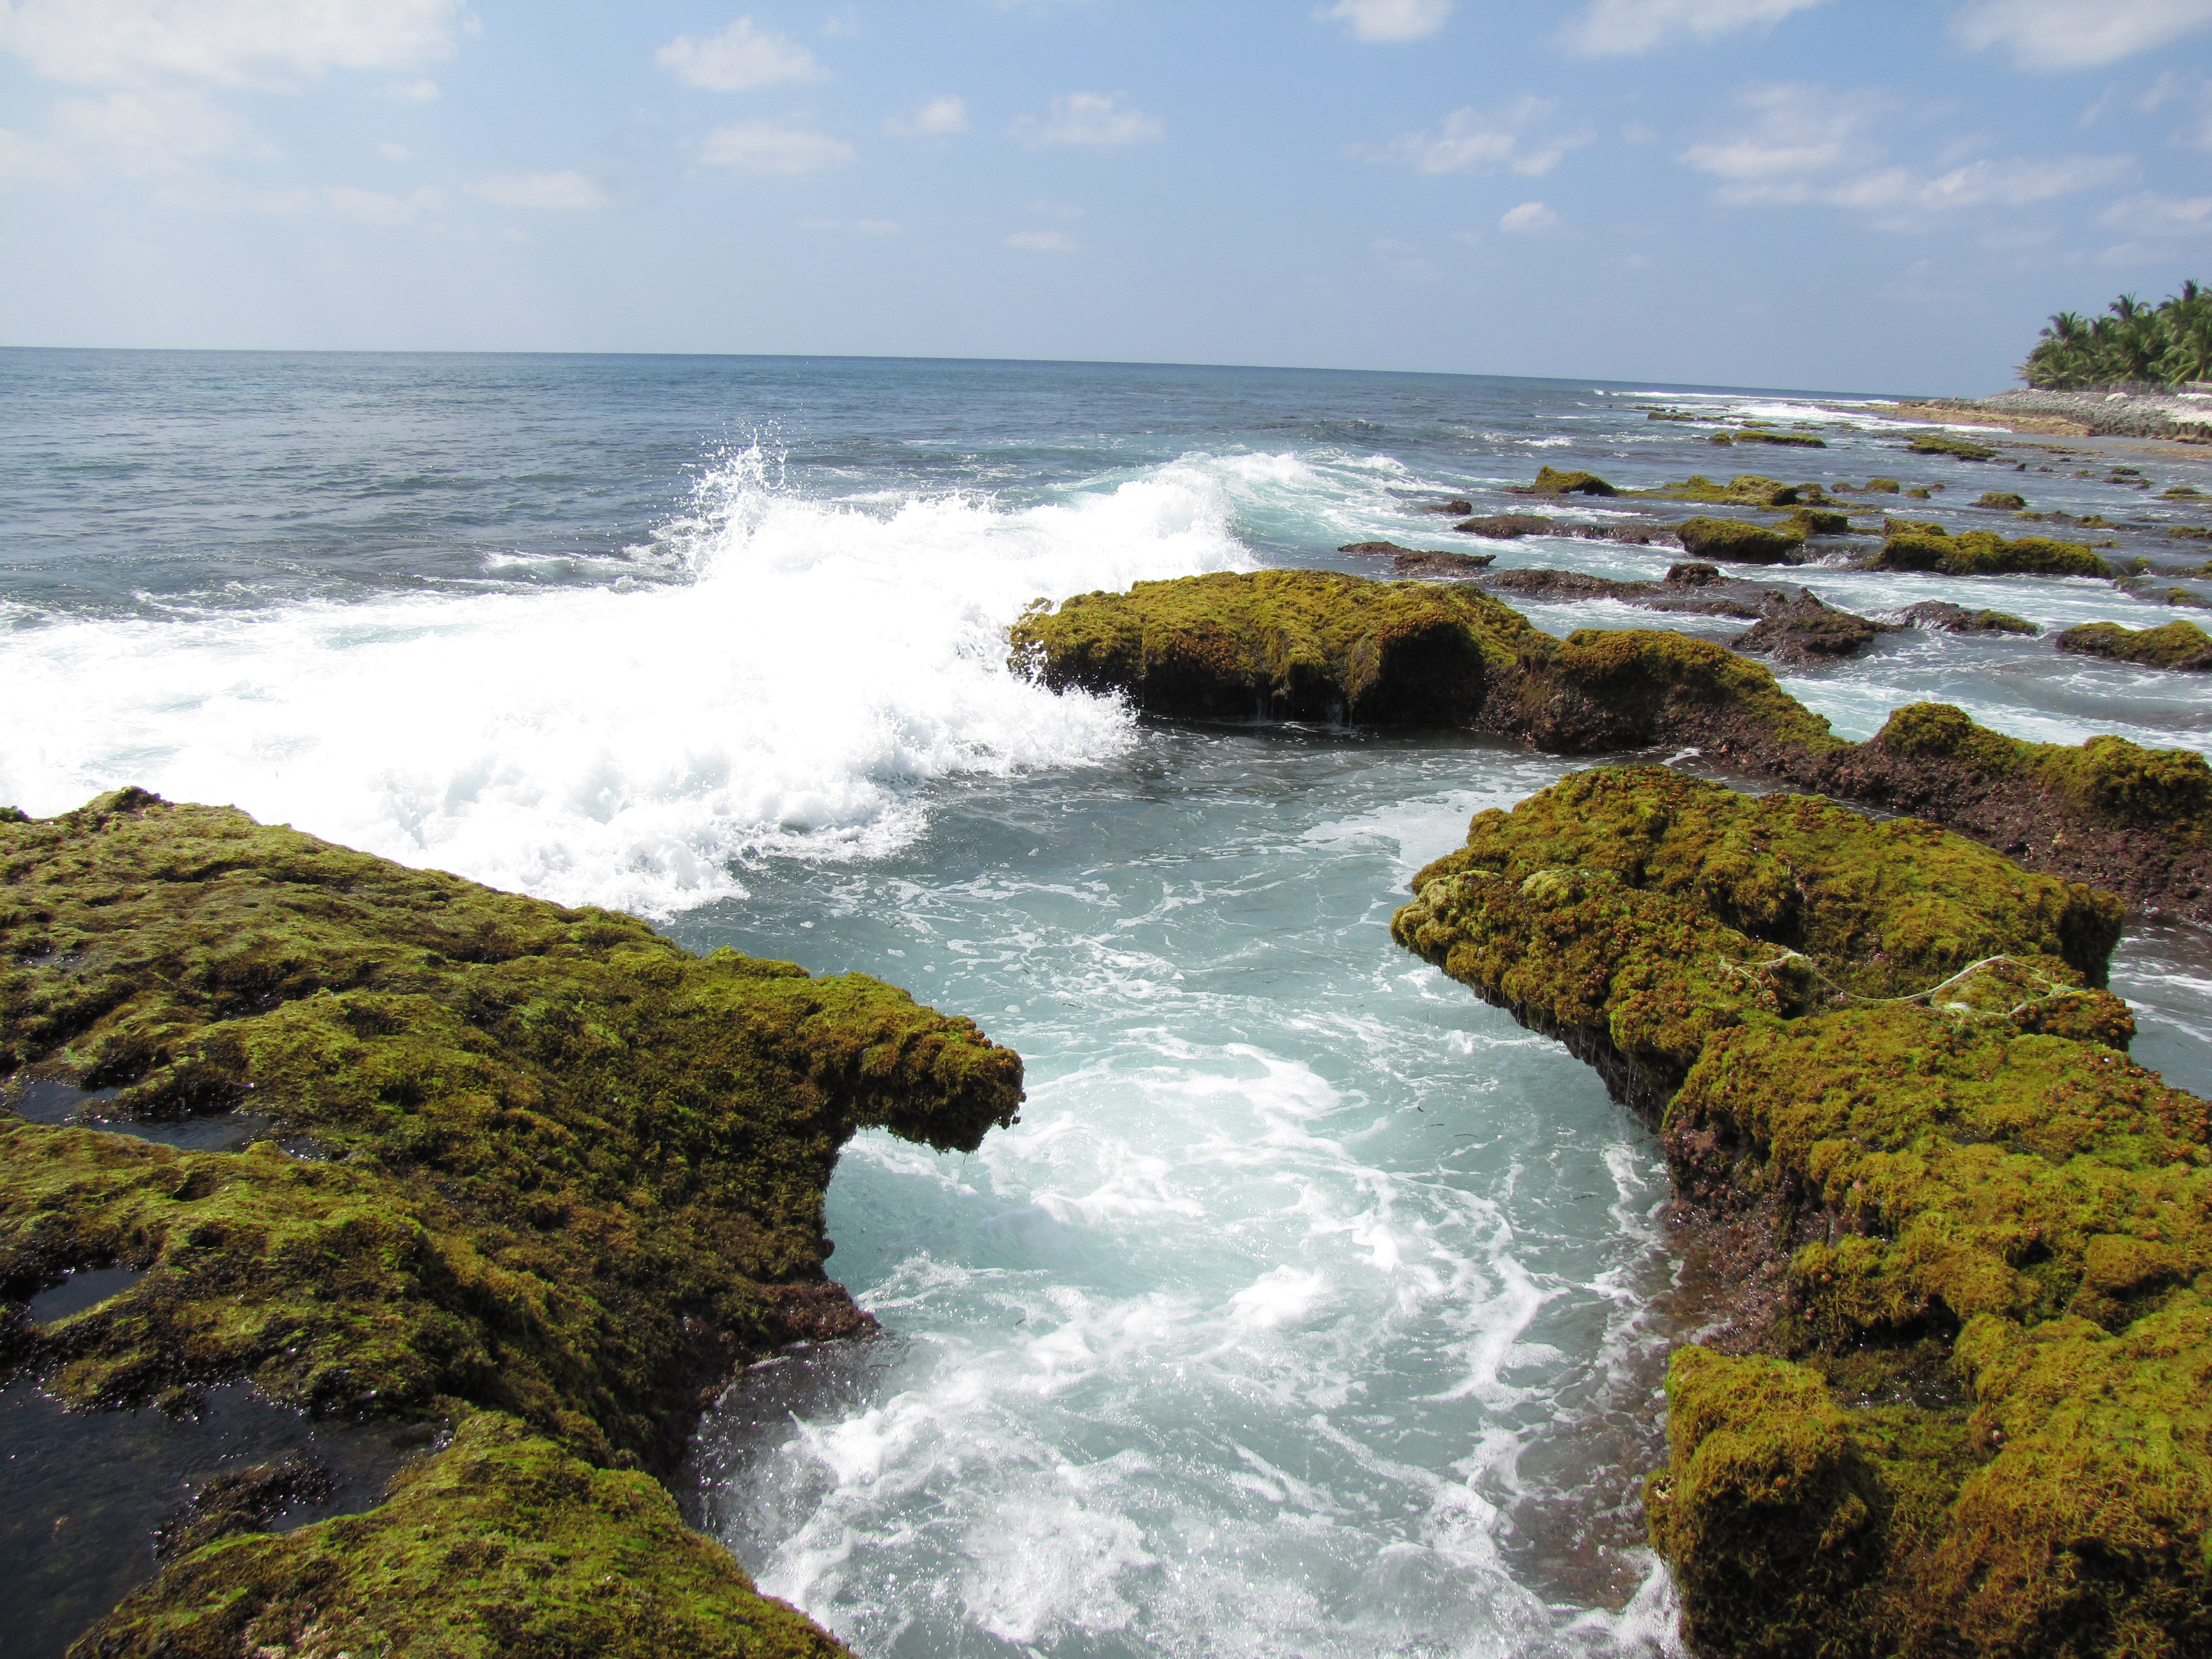 Rocky outcrops on Kalpeni island